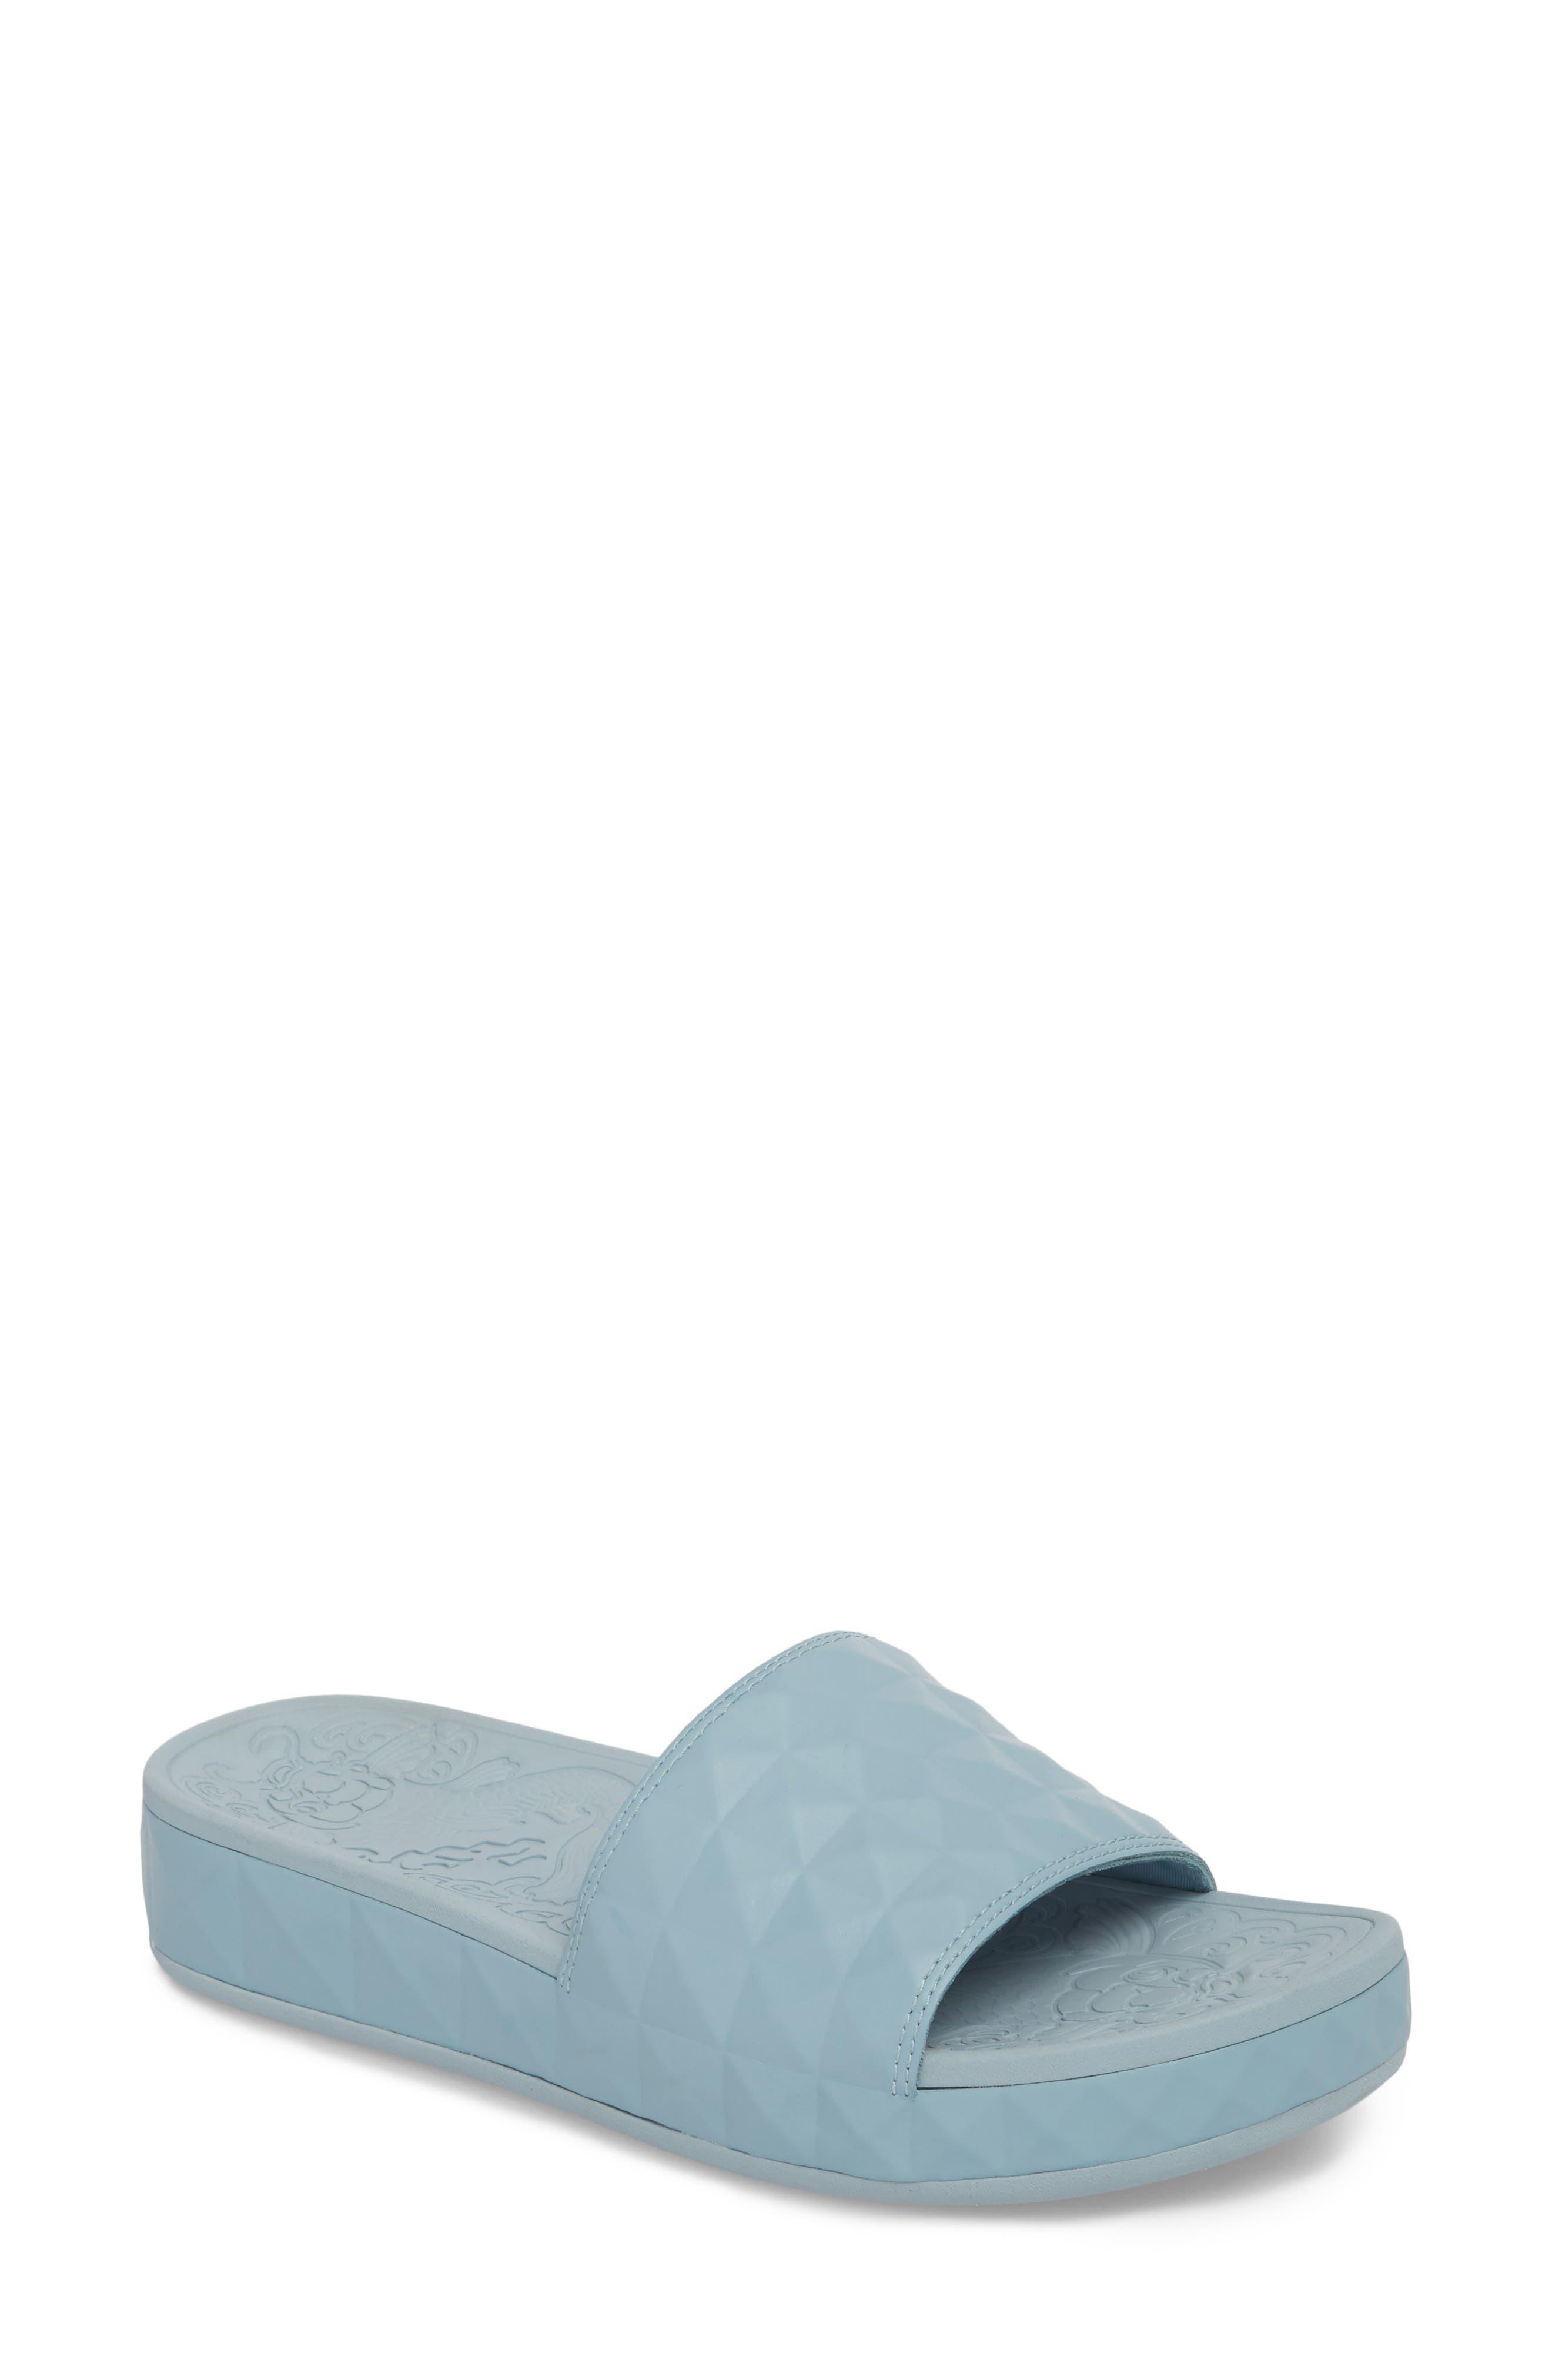 Splash Geo Slide Sandal,                             Main thumbnail 1, color,                             Ice Blue